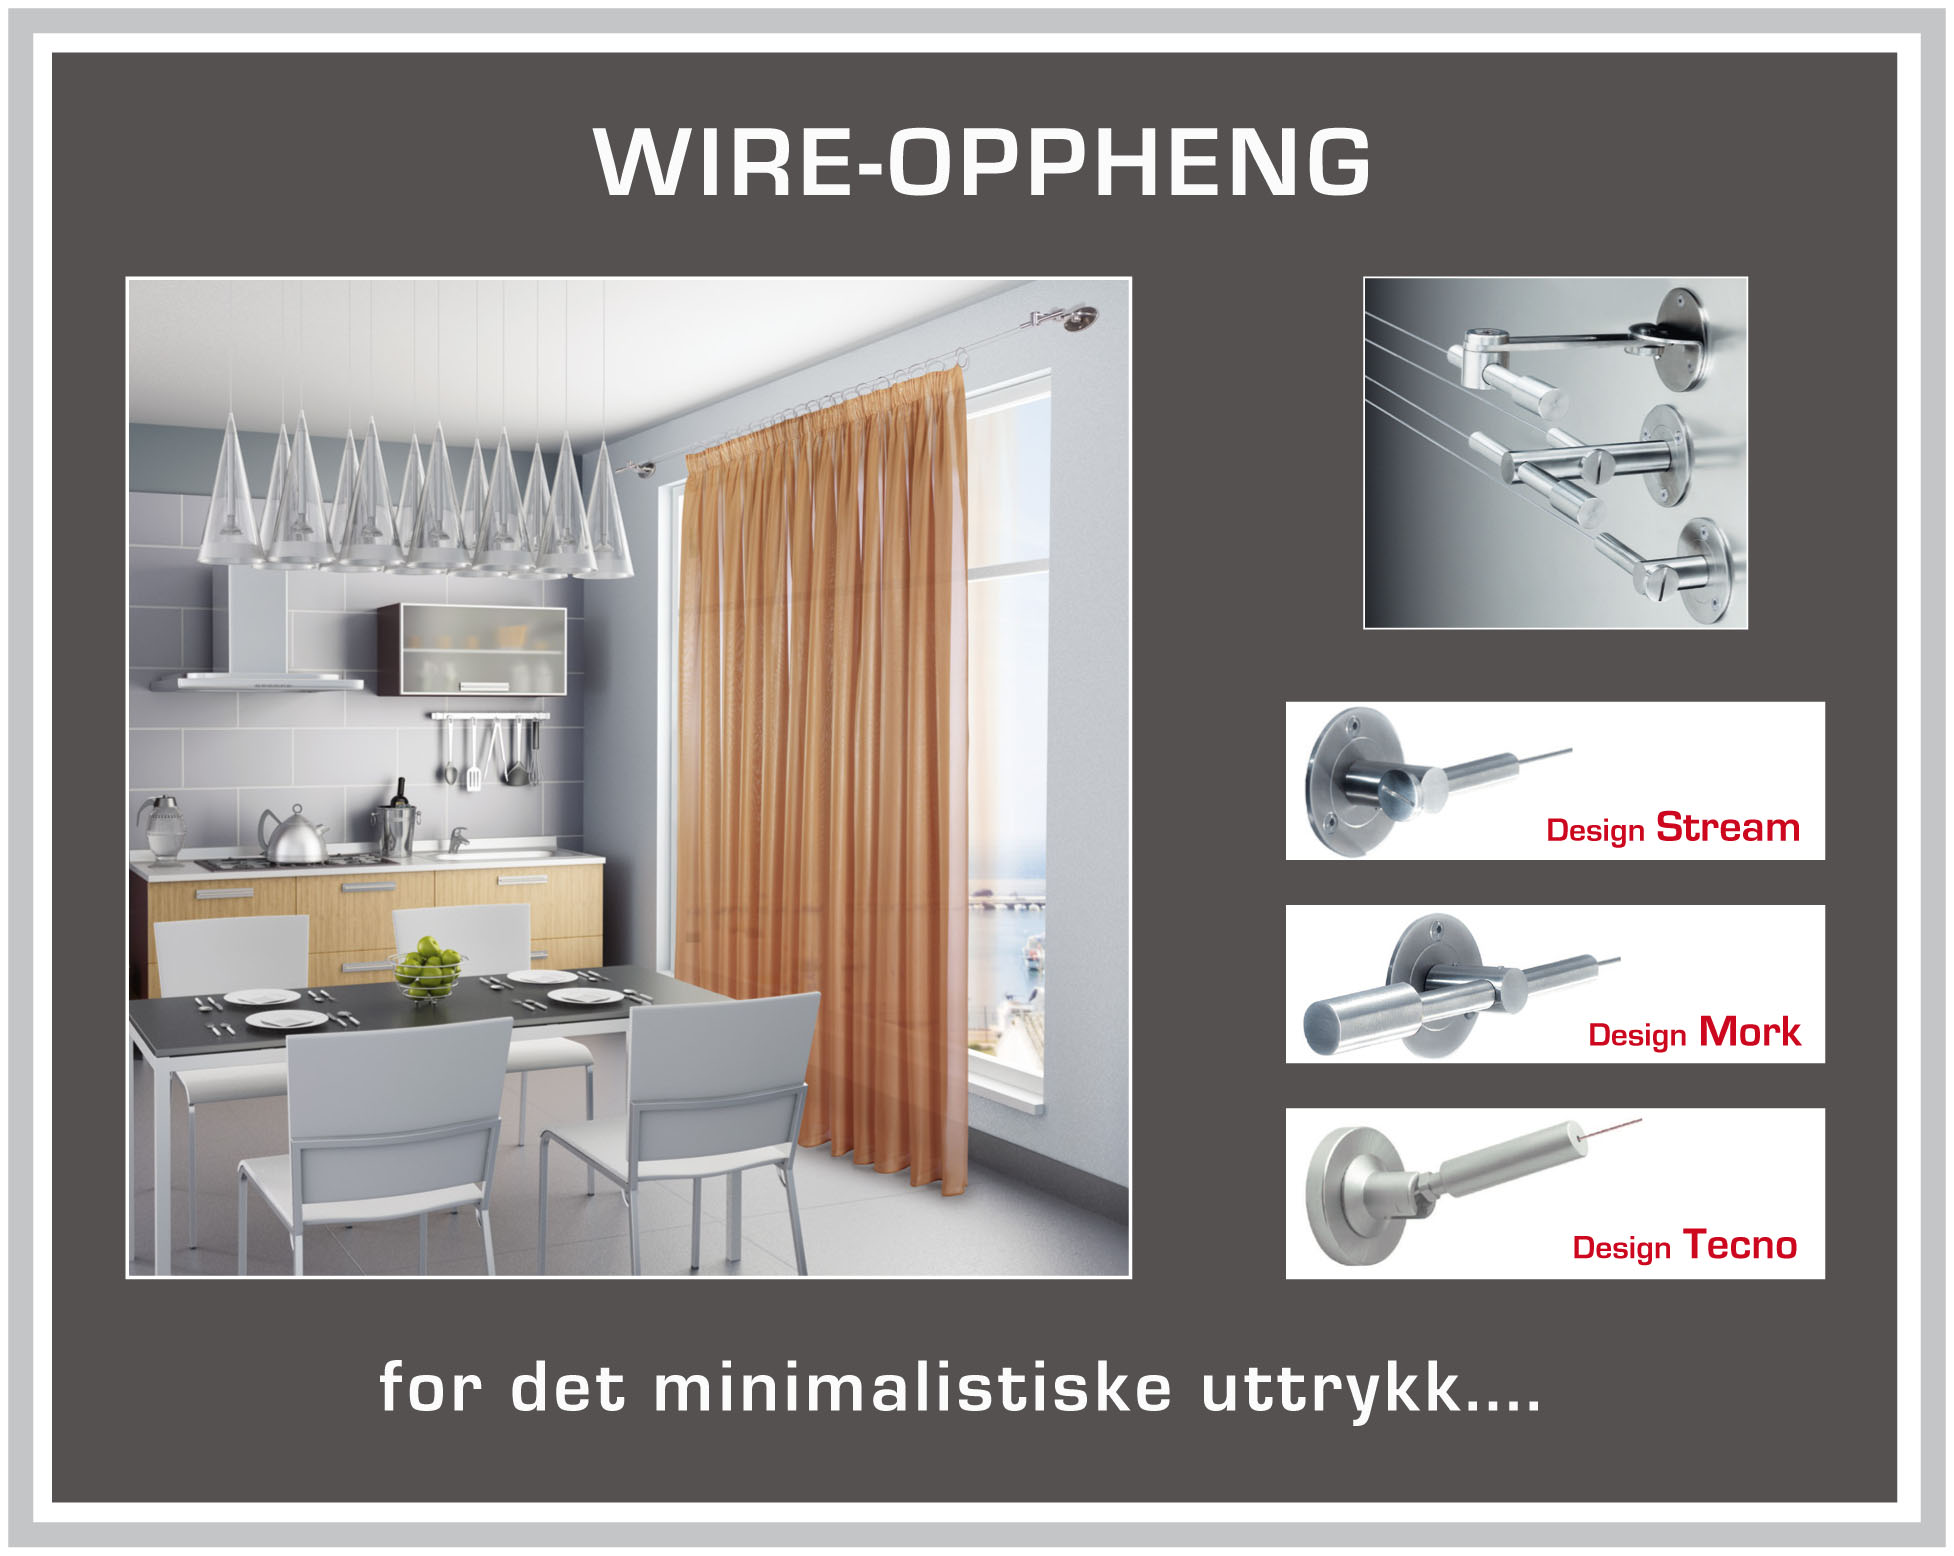 Wire-oppheng